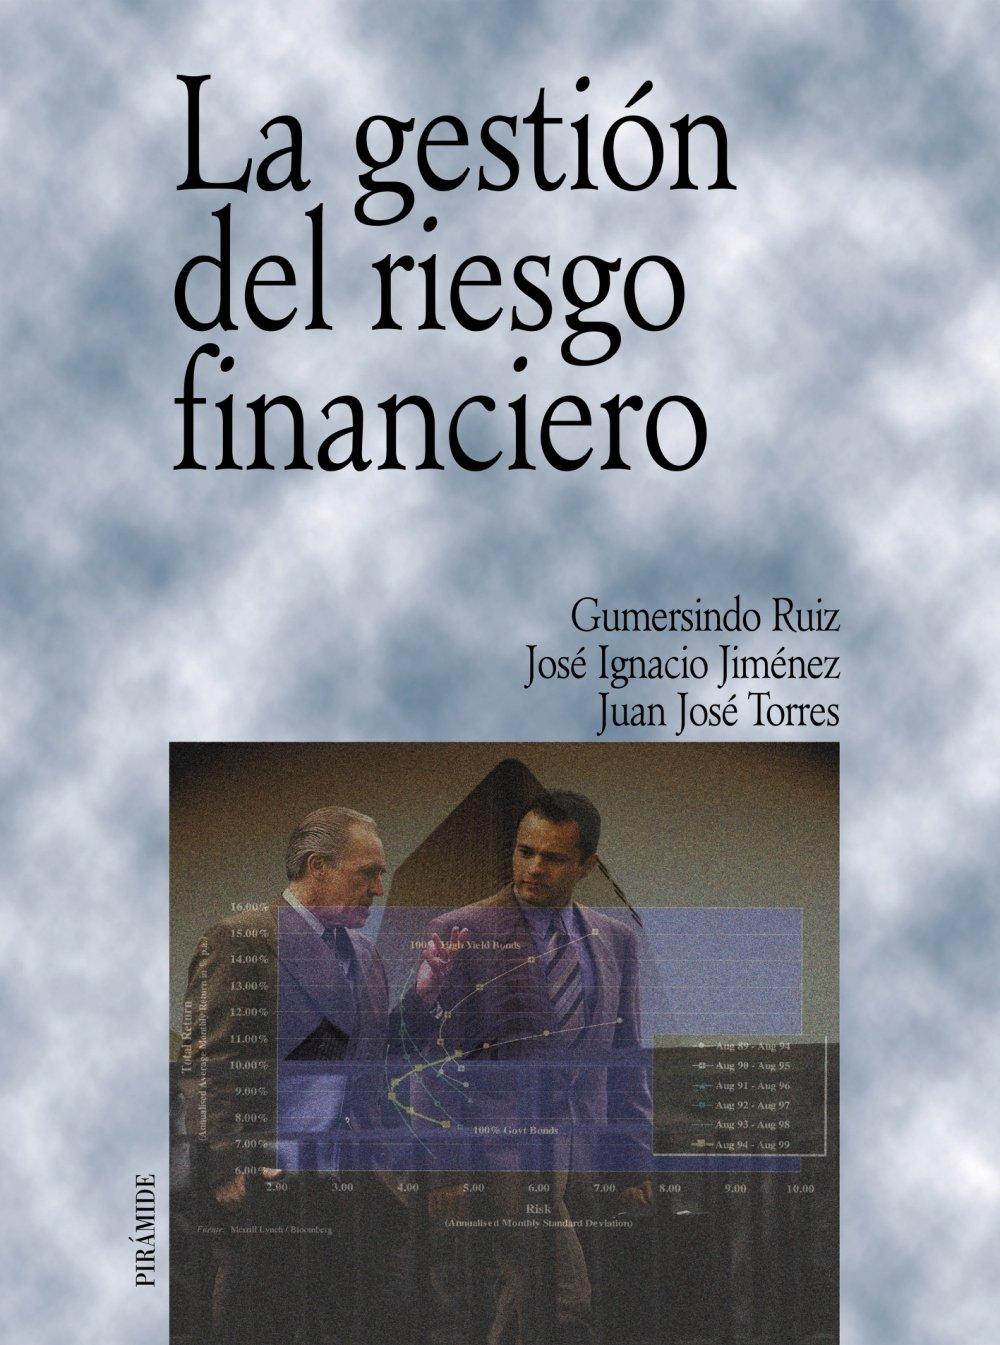 La Gestion Del Riesgo Financiero/ Financial Management (Economia Y Empresa) (Spanish Edition): Gumersindo Ruiz Bravo, Jose Ignacio Jimenez, ...